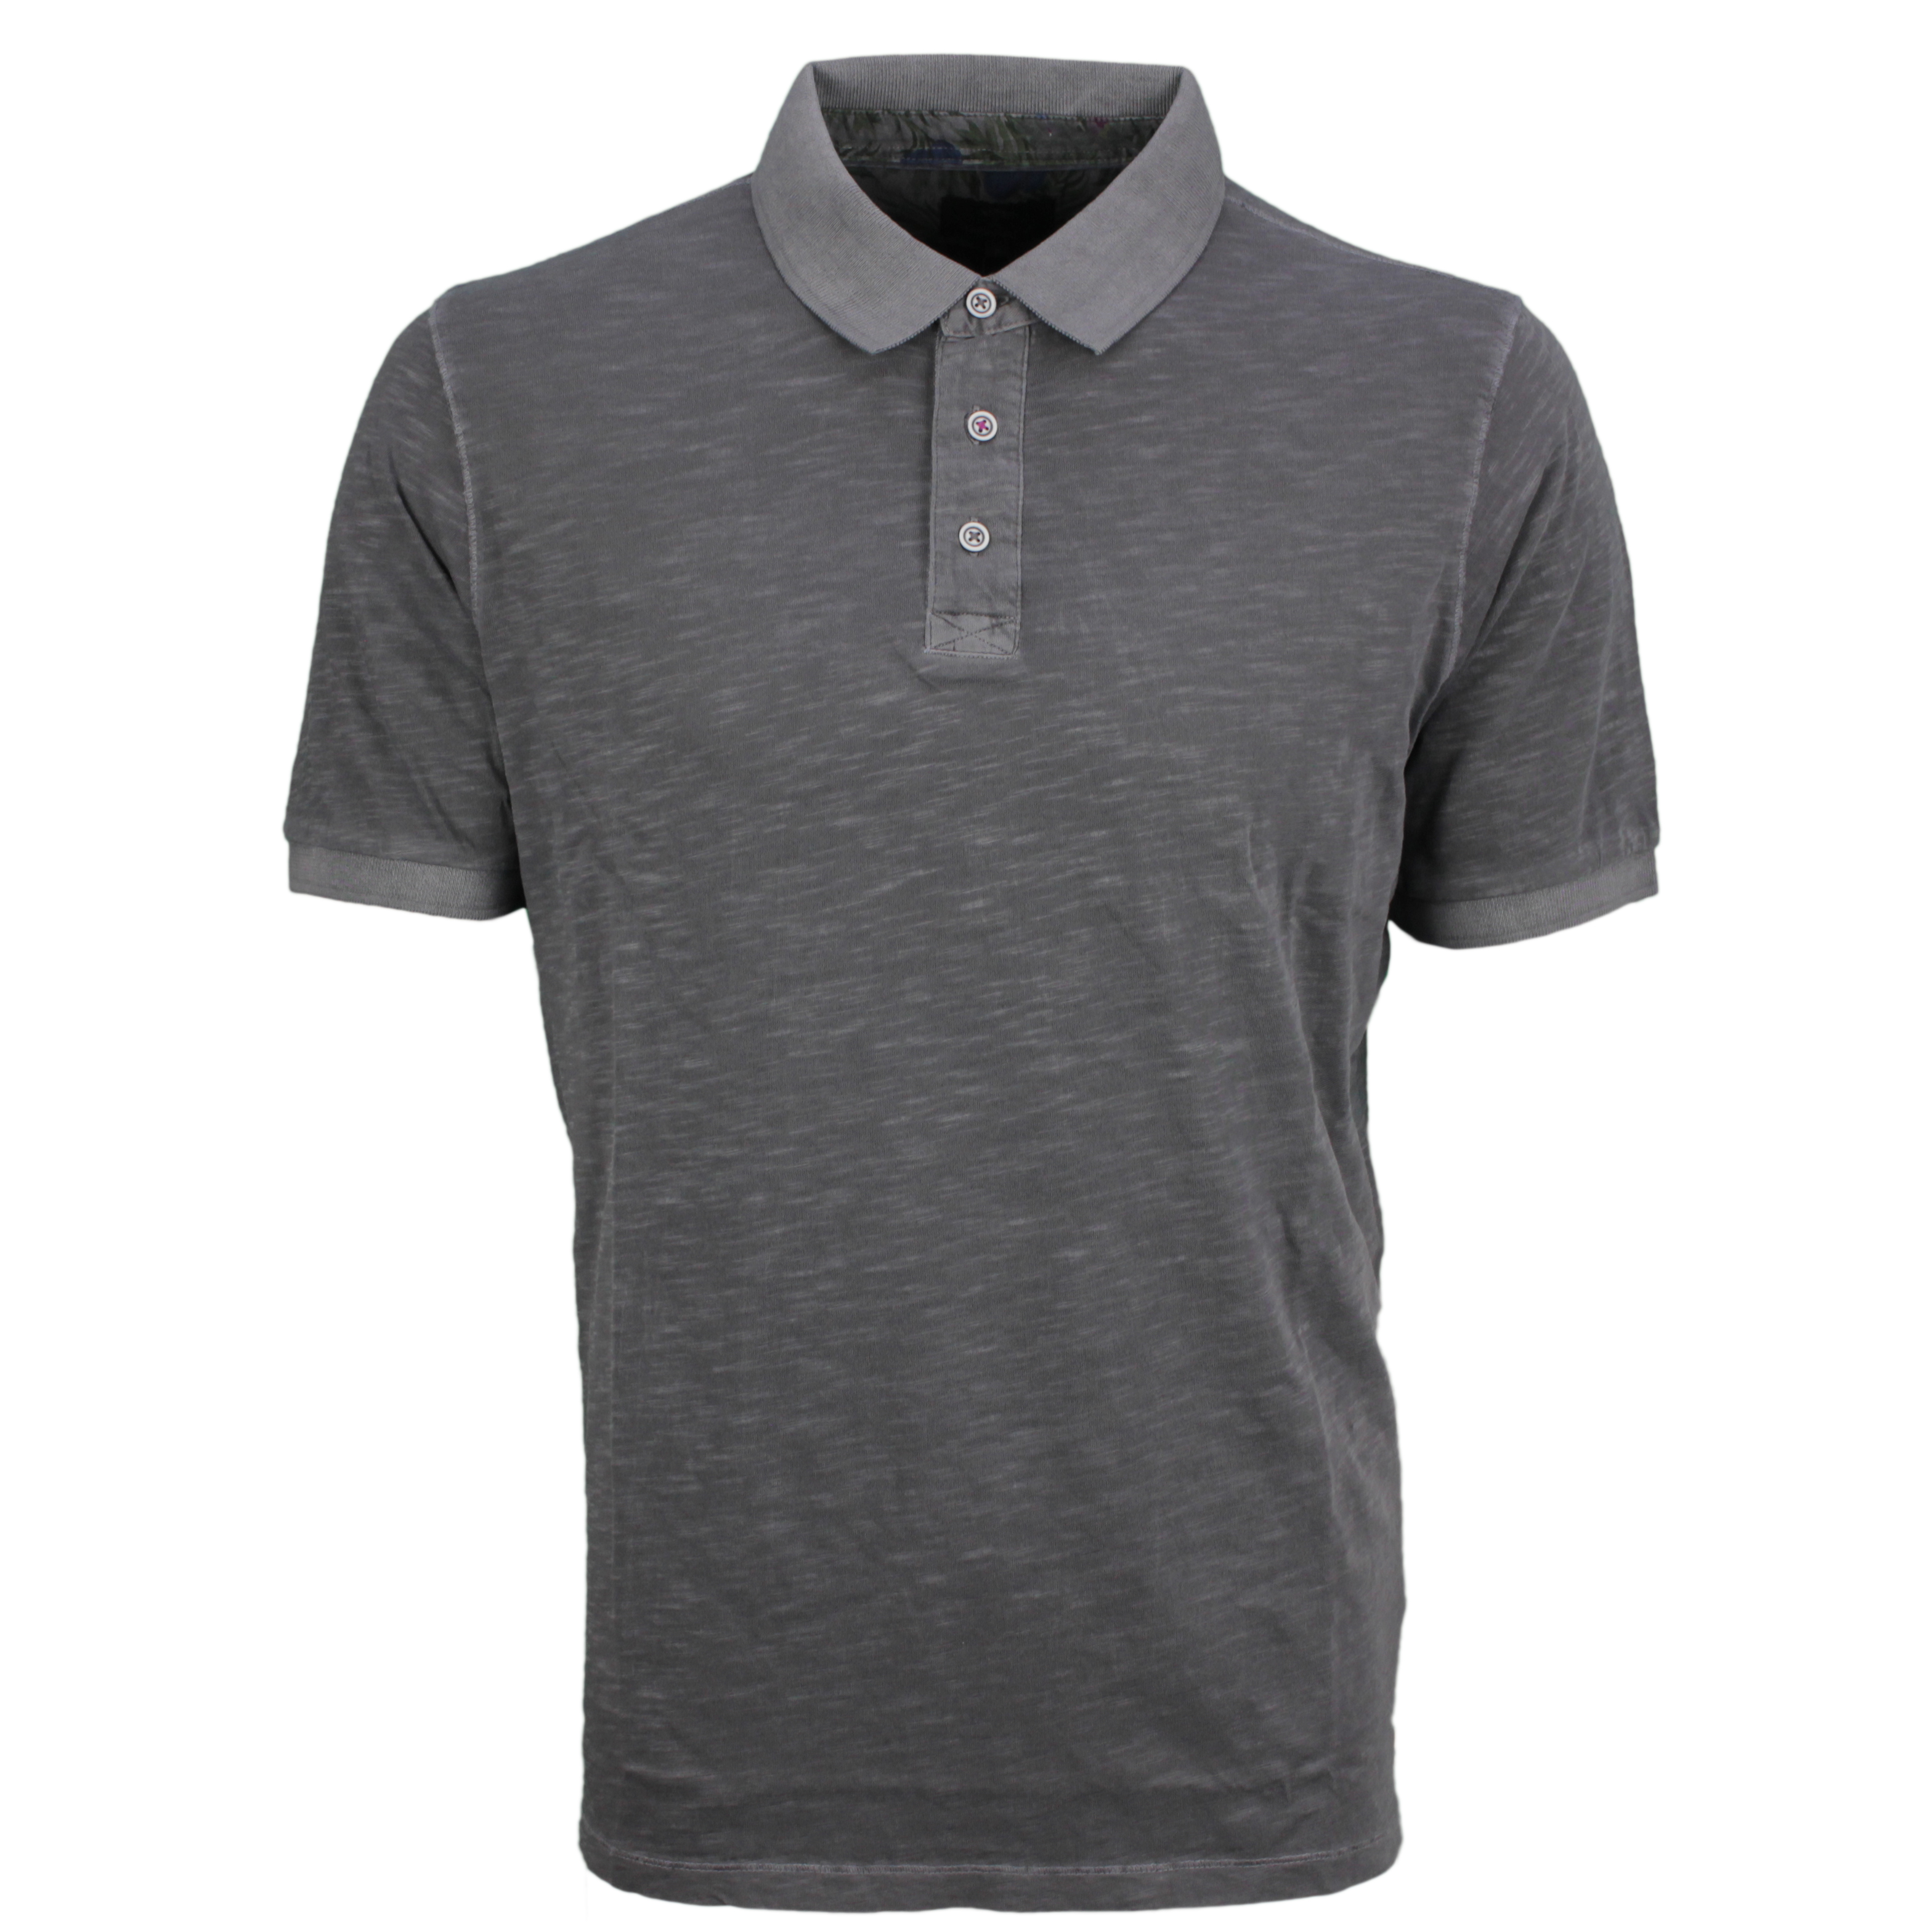 Fynch Hatton Herren Polo Shirt anthrazit meliert 11211740 970 asphalt